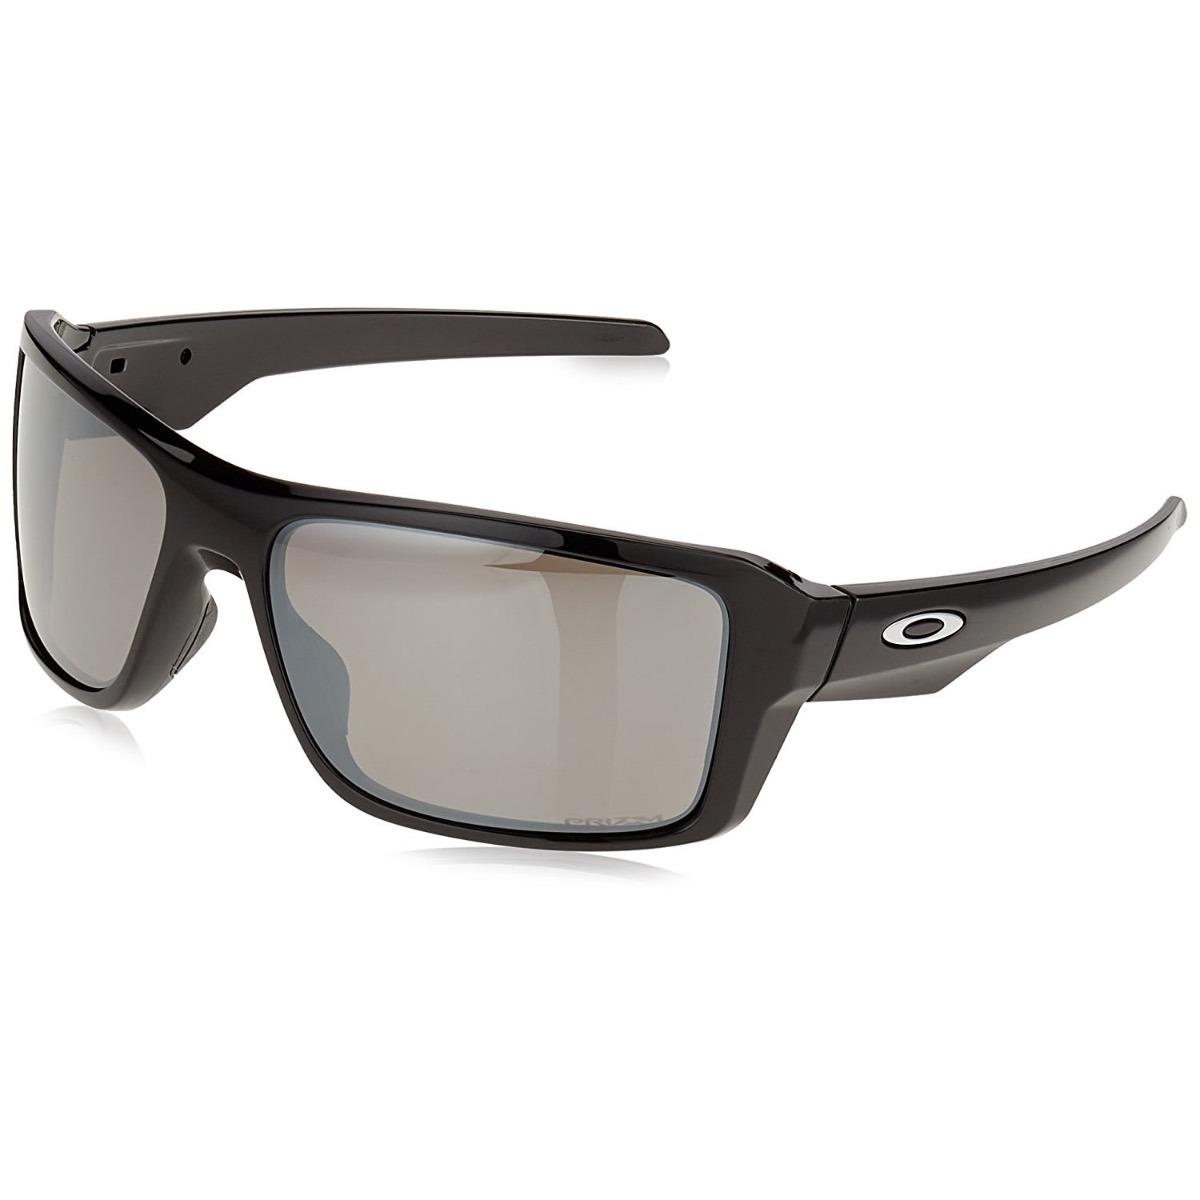 a74364f9186 oakley double edge polished black - prizm black polarized. Cargando zoom.